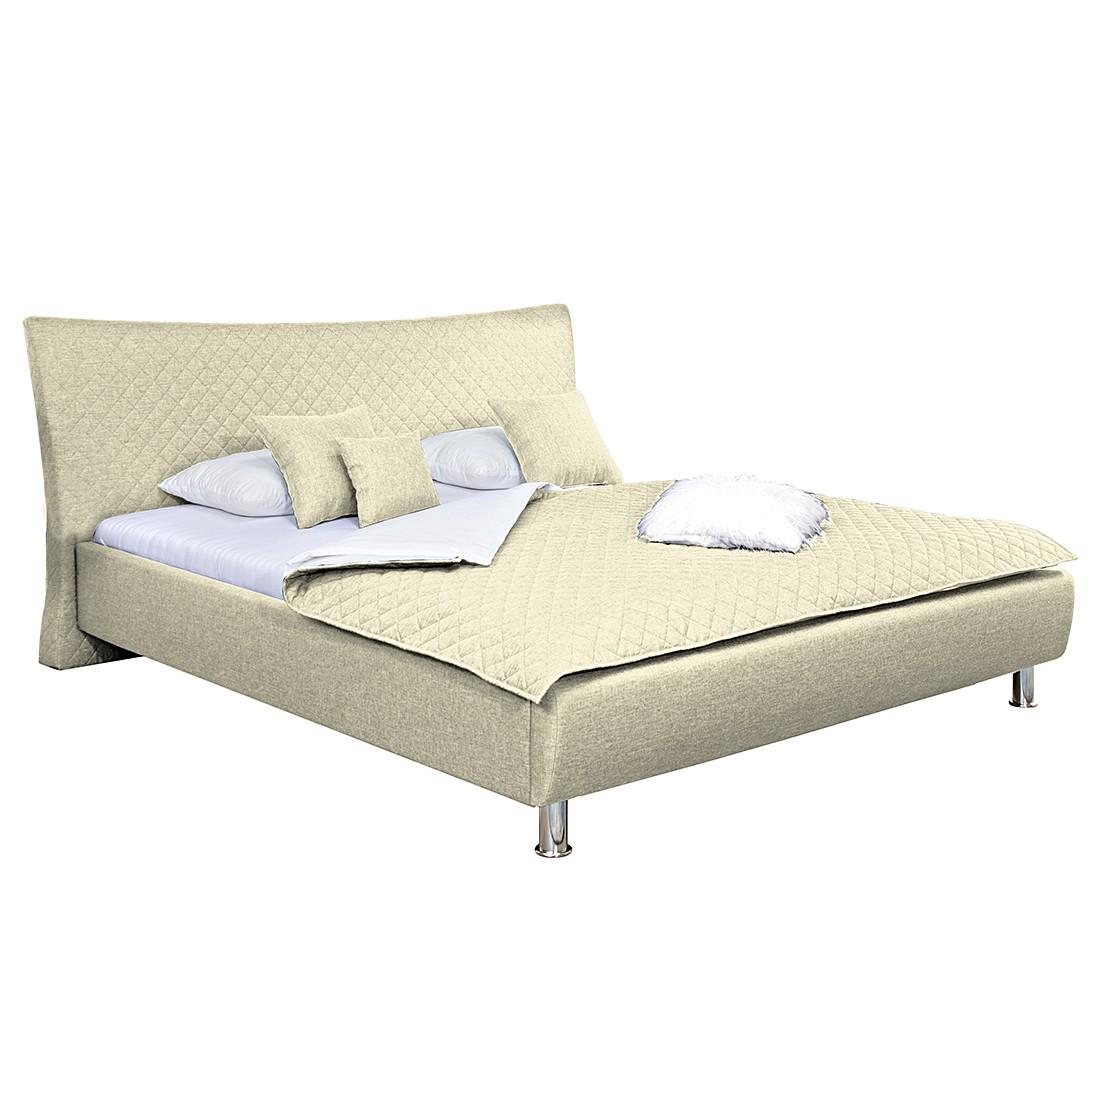 polsterbett nerika webstoff 140 x 200cm bettgestell ohne matratze lattenrost beige. Black Bedroom Furniture Sets. Home Design Ideas